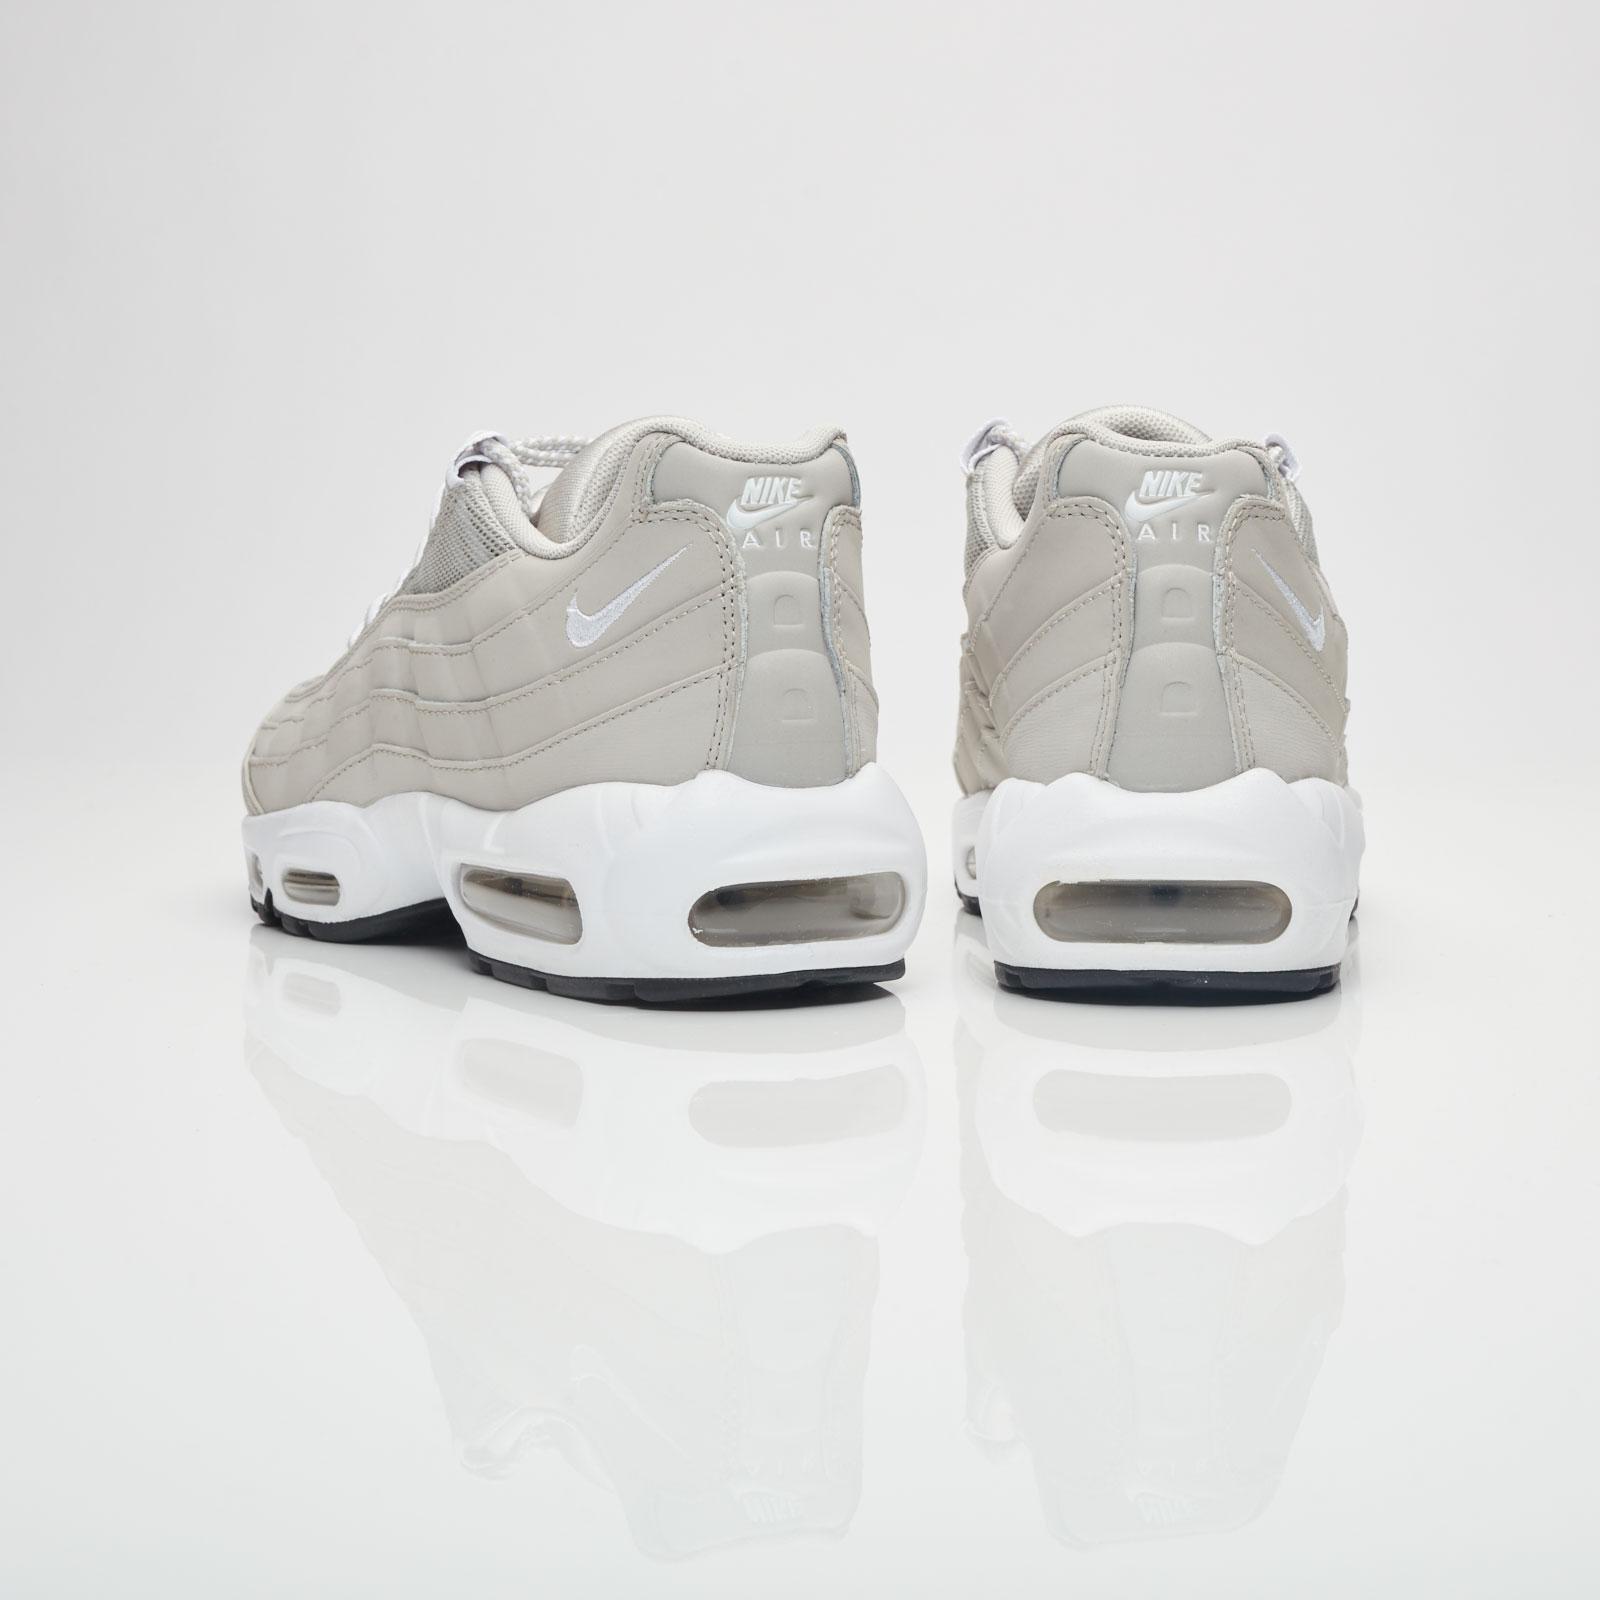 best service 78fdc 7cbd7 Nike Sportswear Air Max 95 Nike Sportswear Air Max 95 ...